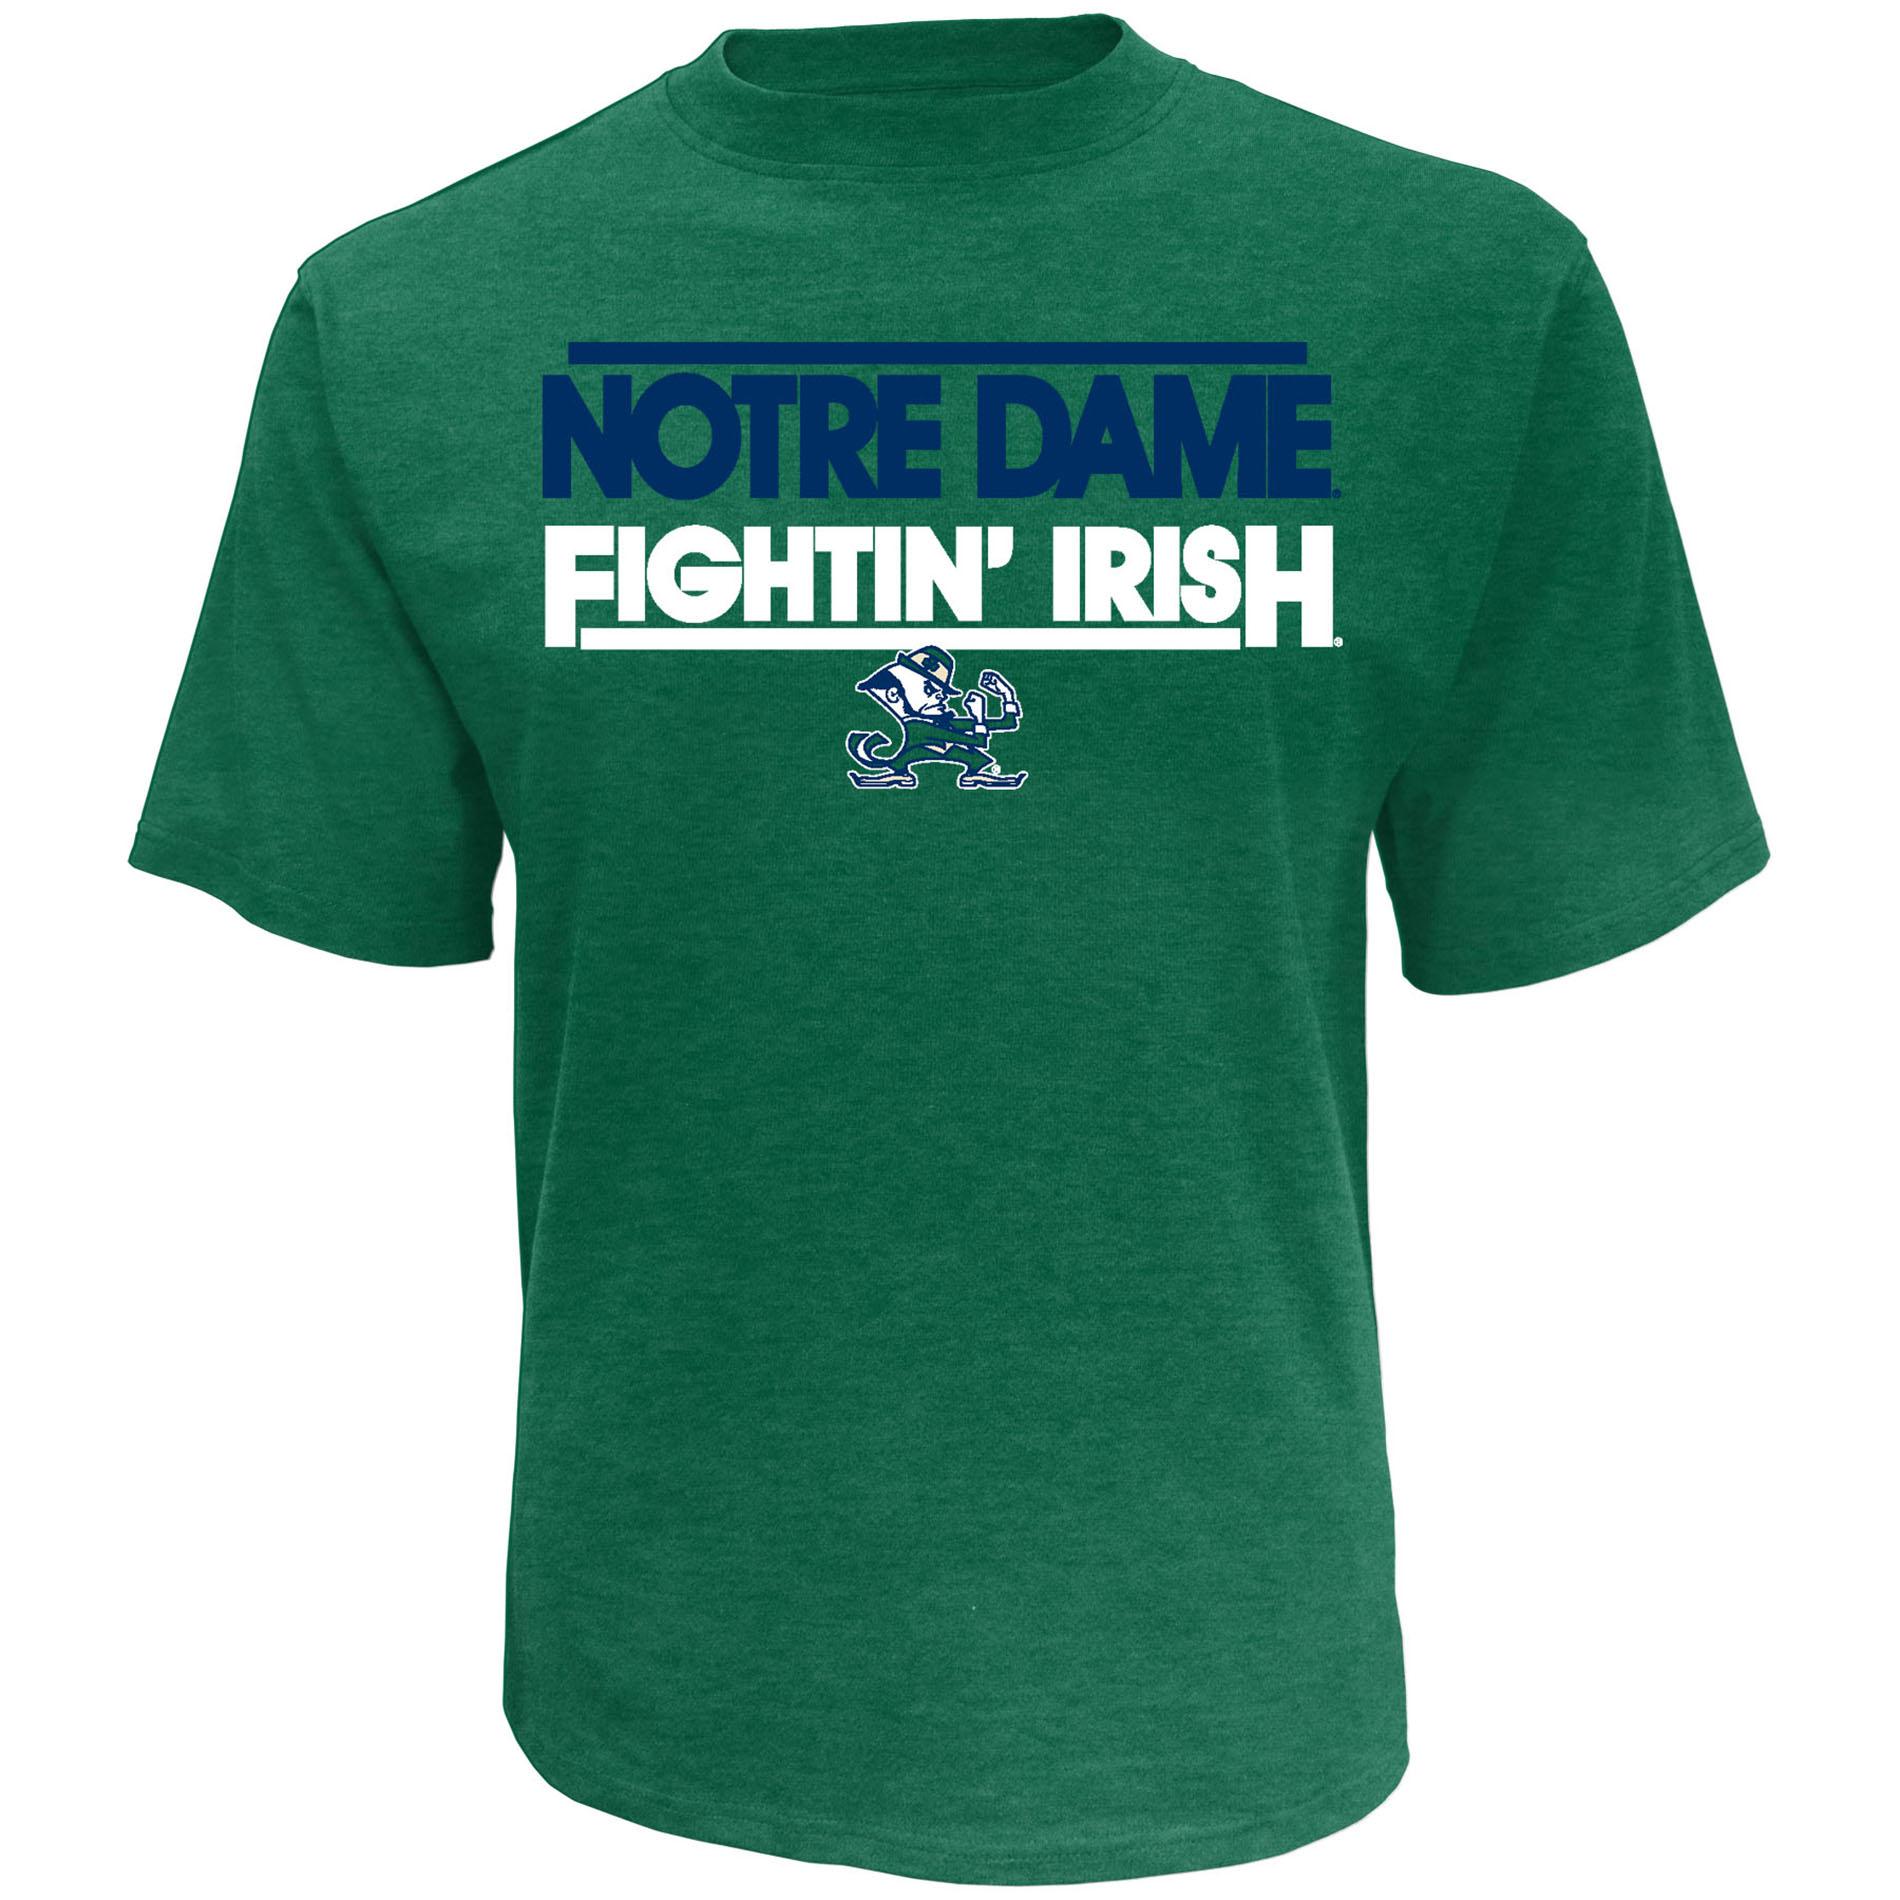 NCAA Mens' University of Notre Dame Fighting Irish Short Sleeve Athletic Tee PartNumber: 046VA88426012P MfgPartNumber: 7AMCA20KMF